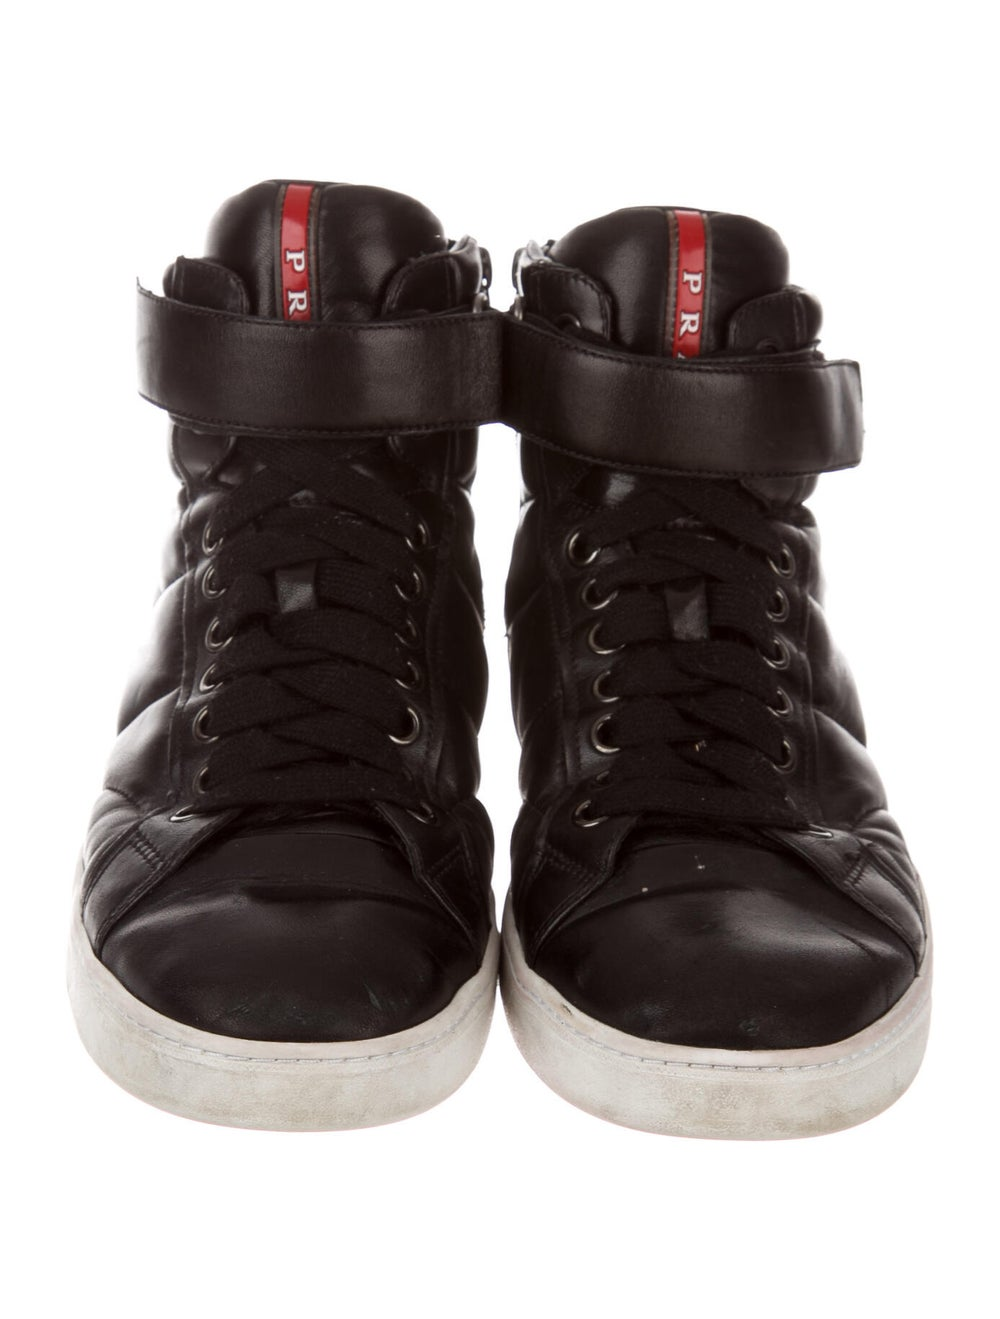 Prada Sport Leather Sneakers Black - image 3